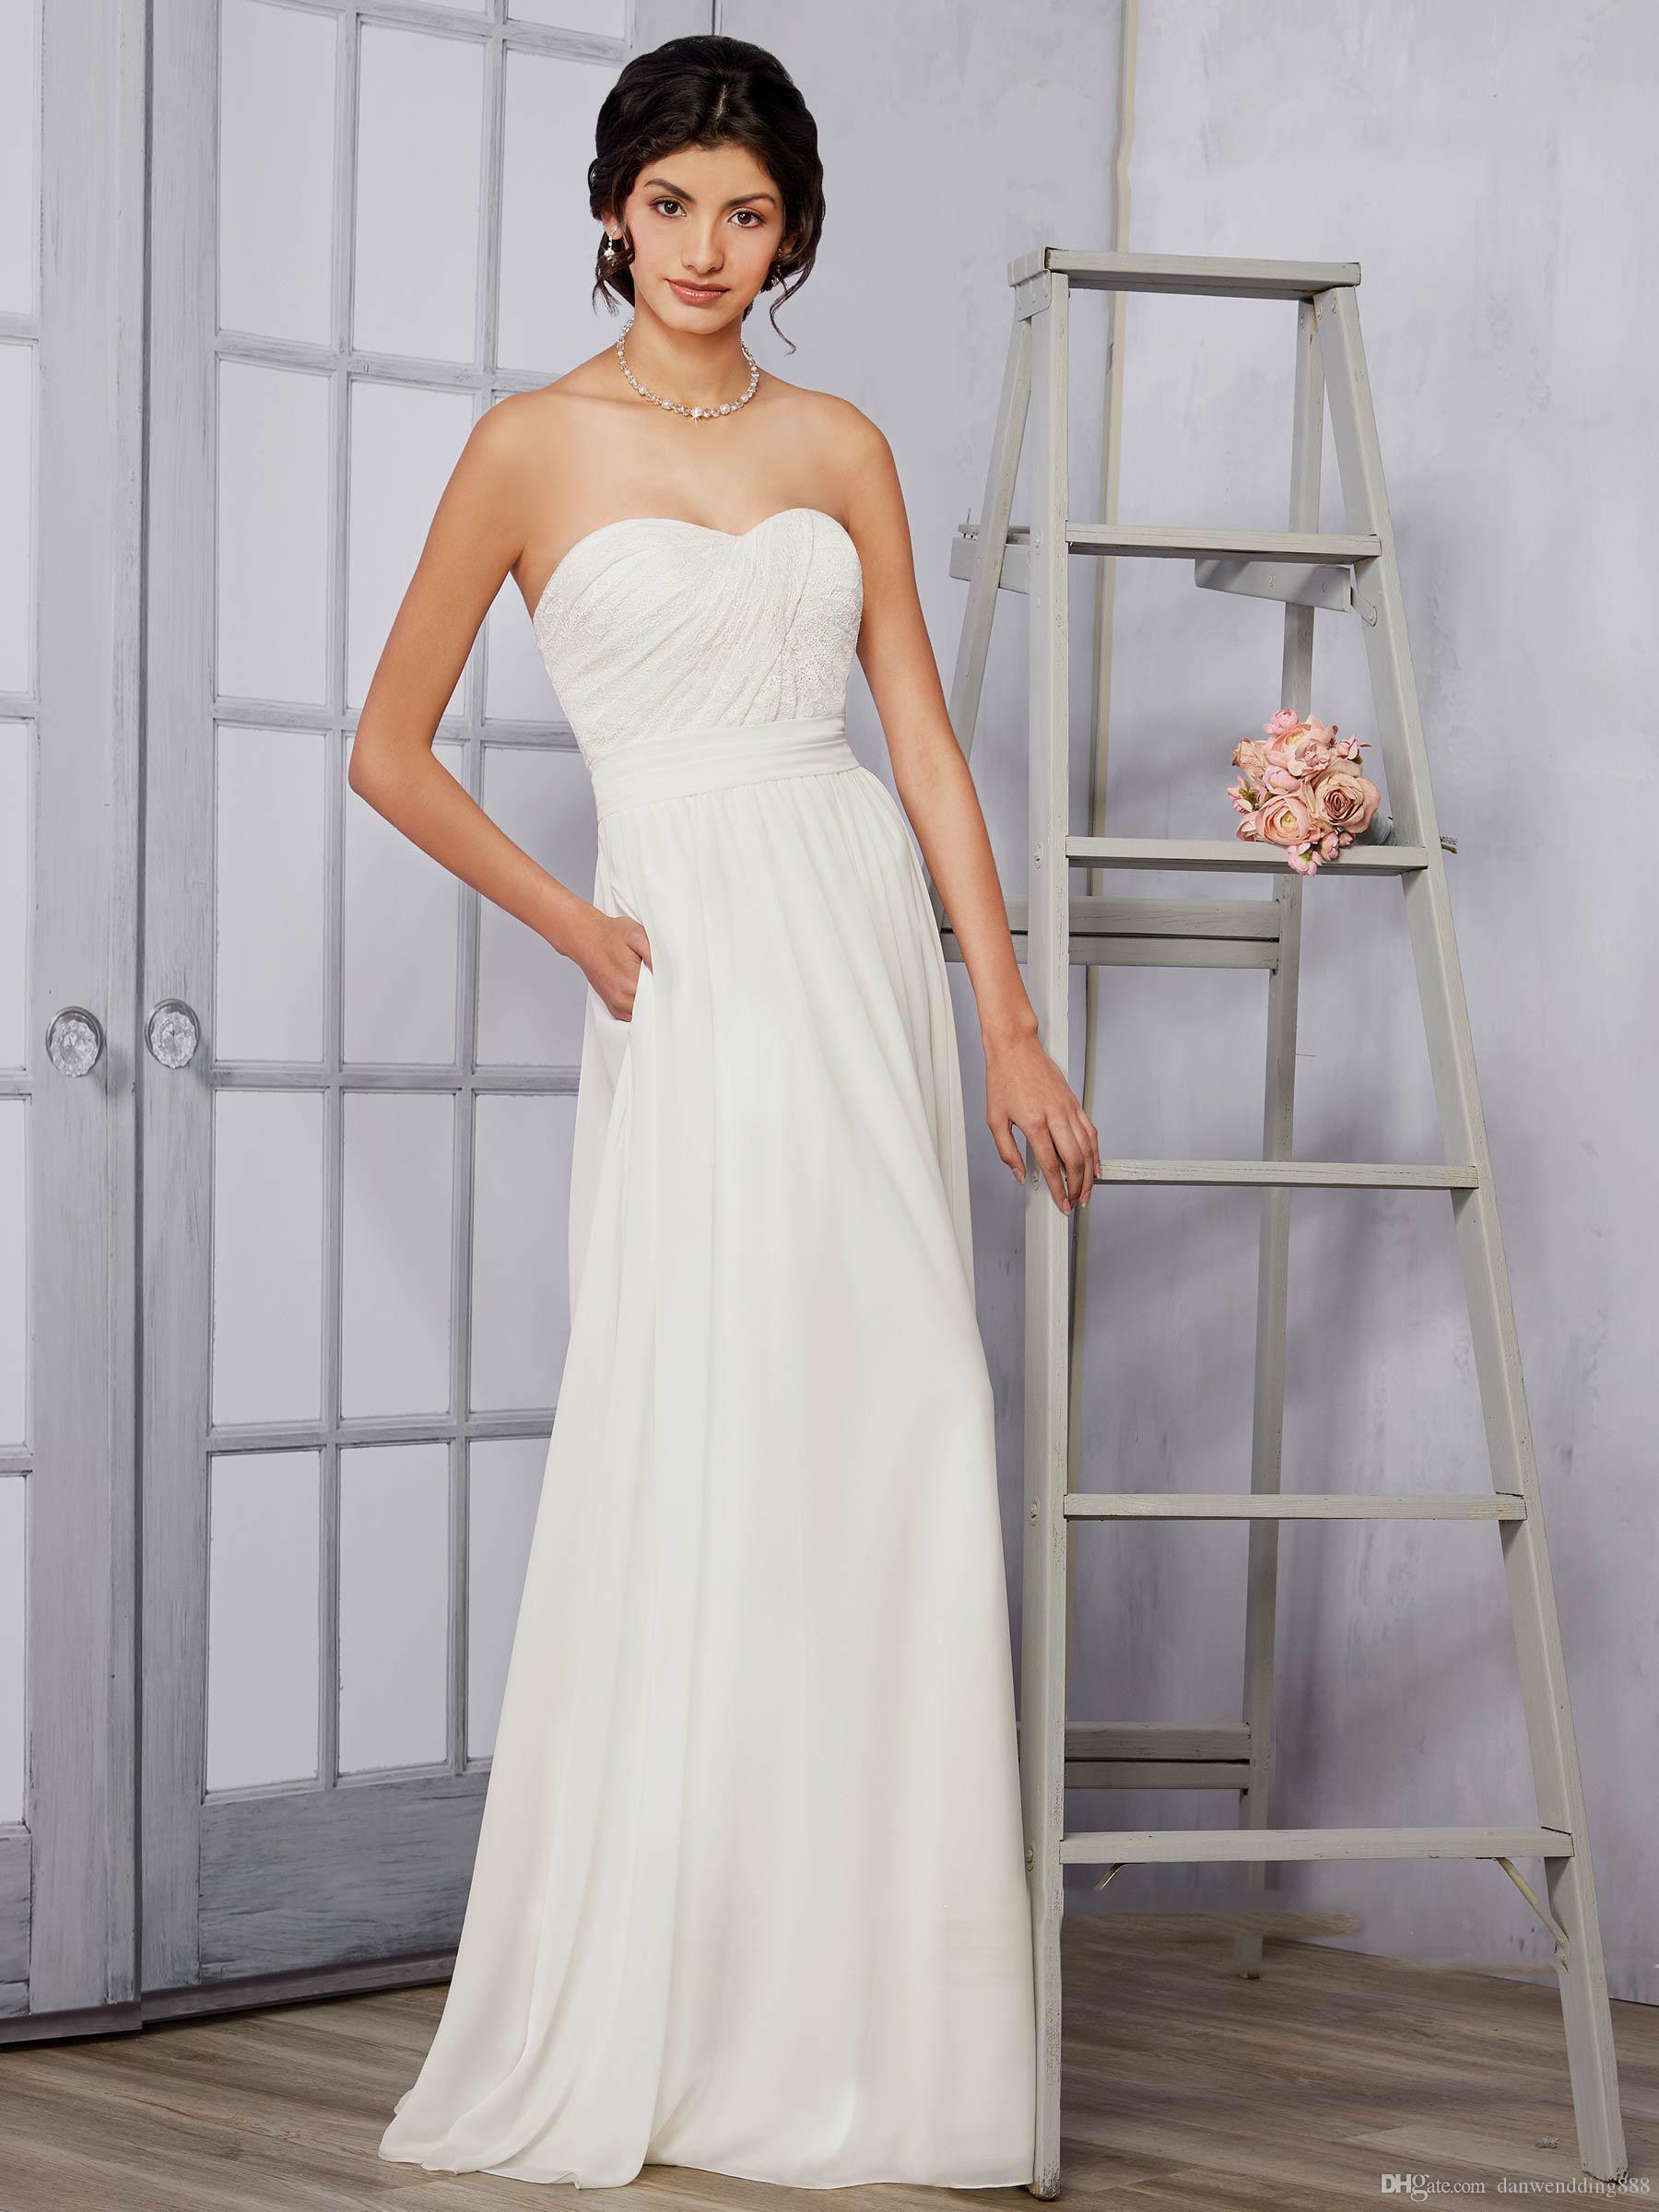 White Dress Strapless Sheath Gown